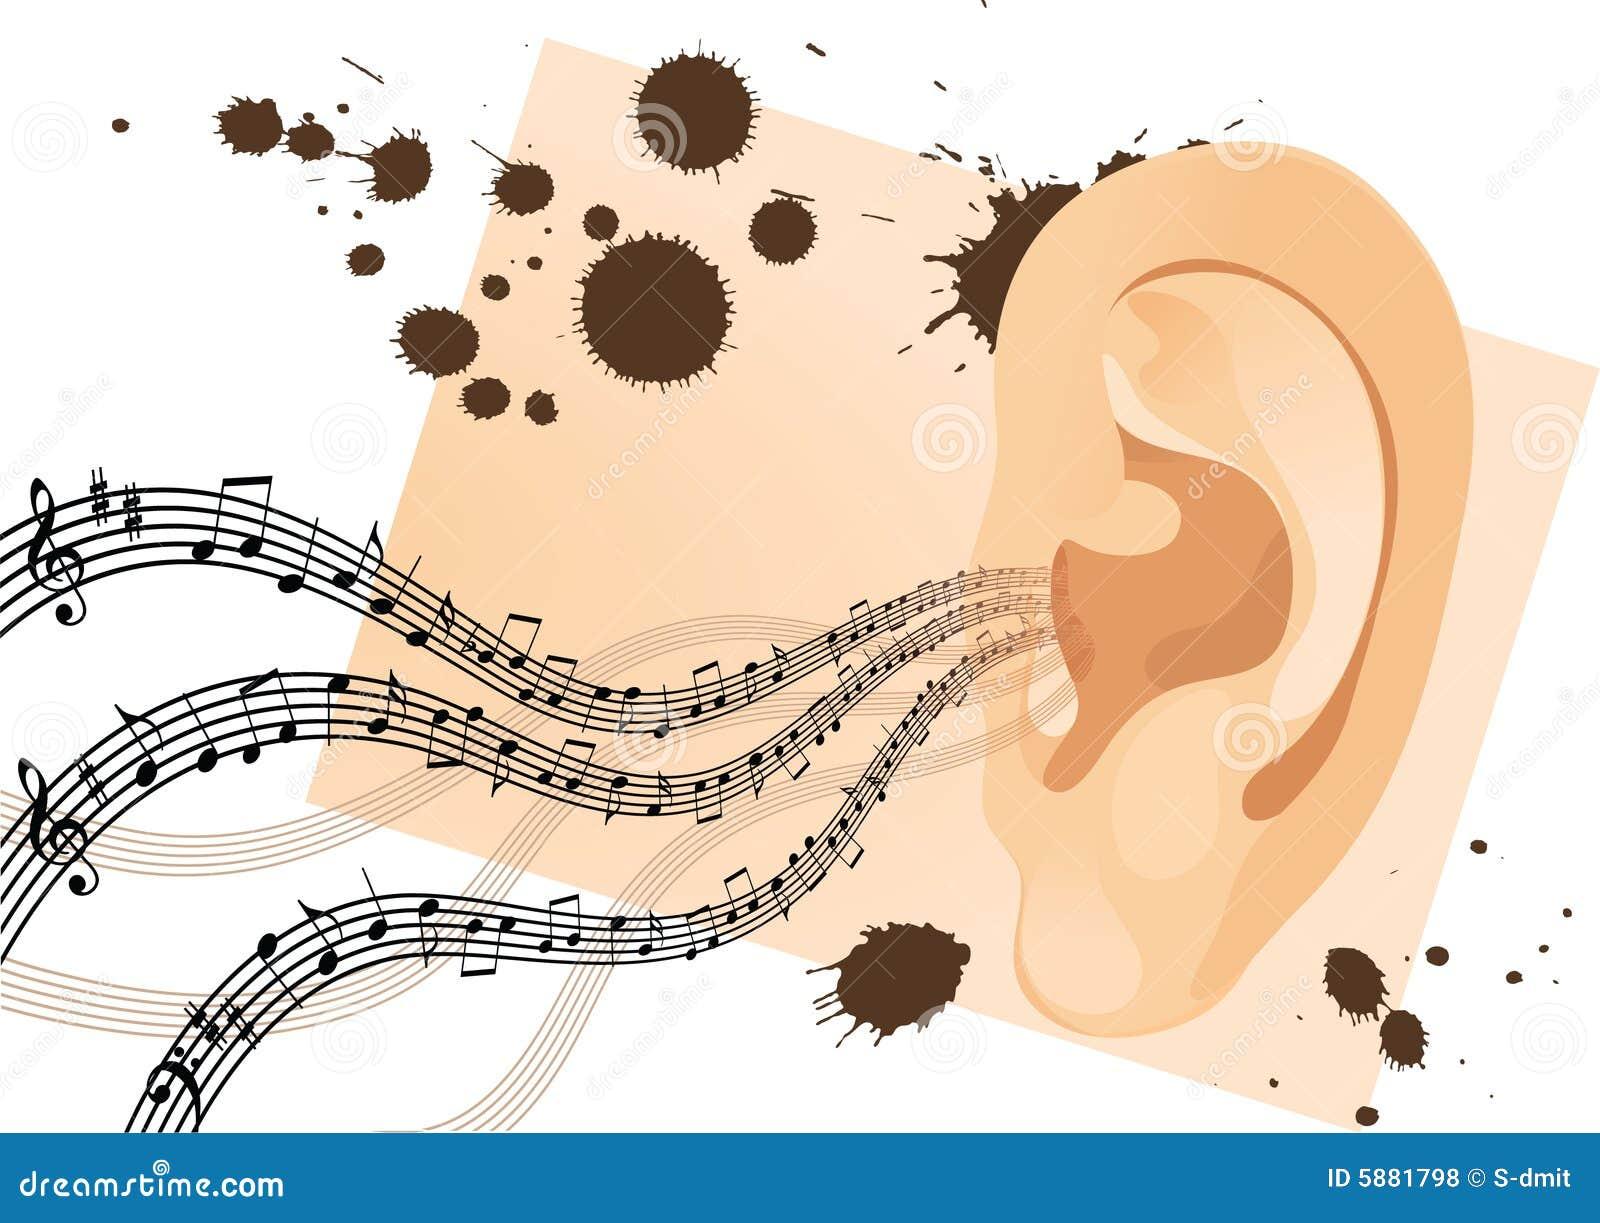 Human Nature - A Symphony Of Hits